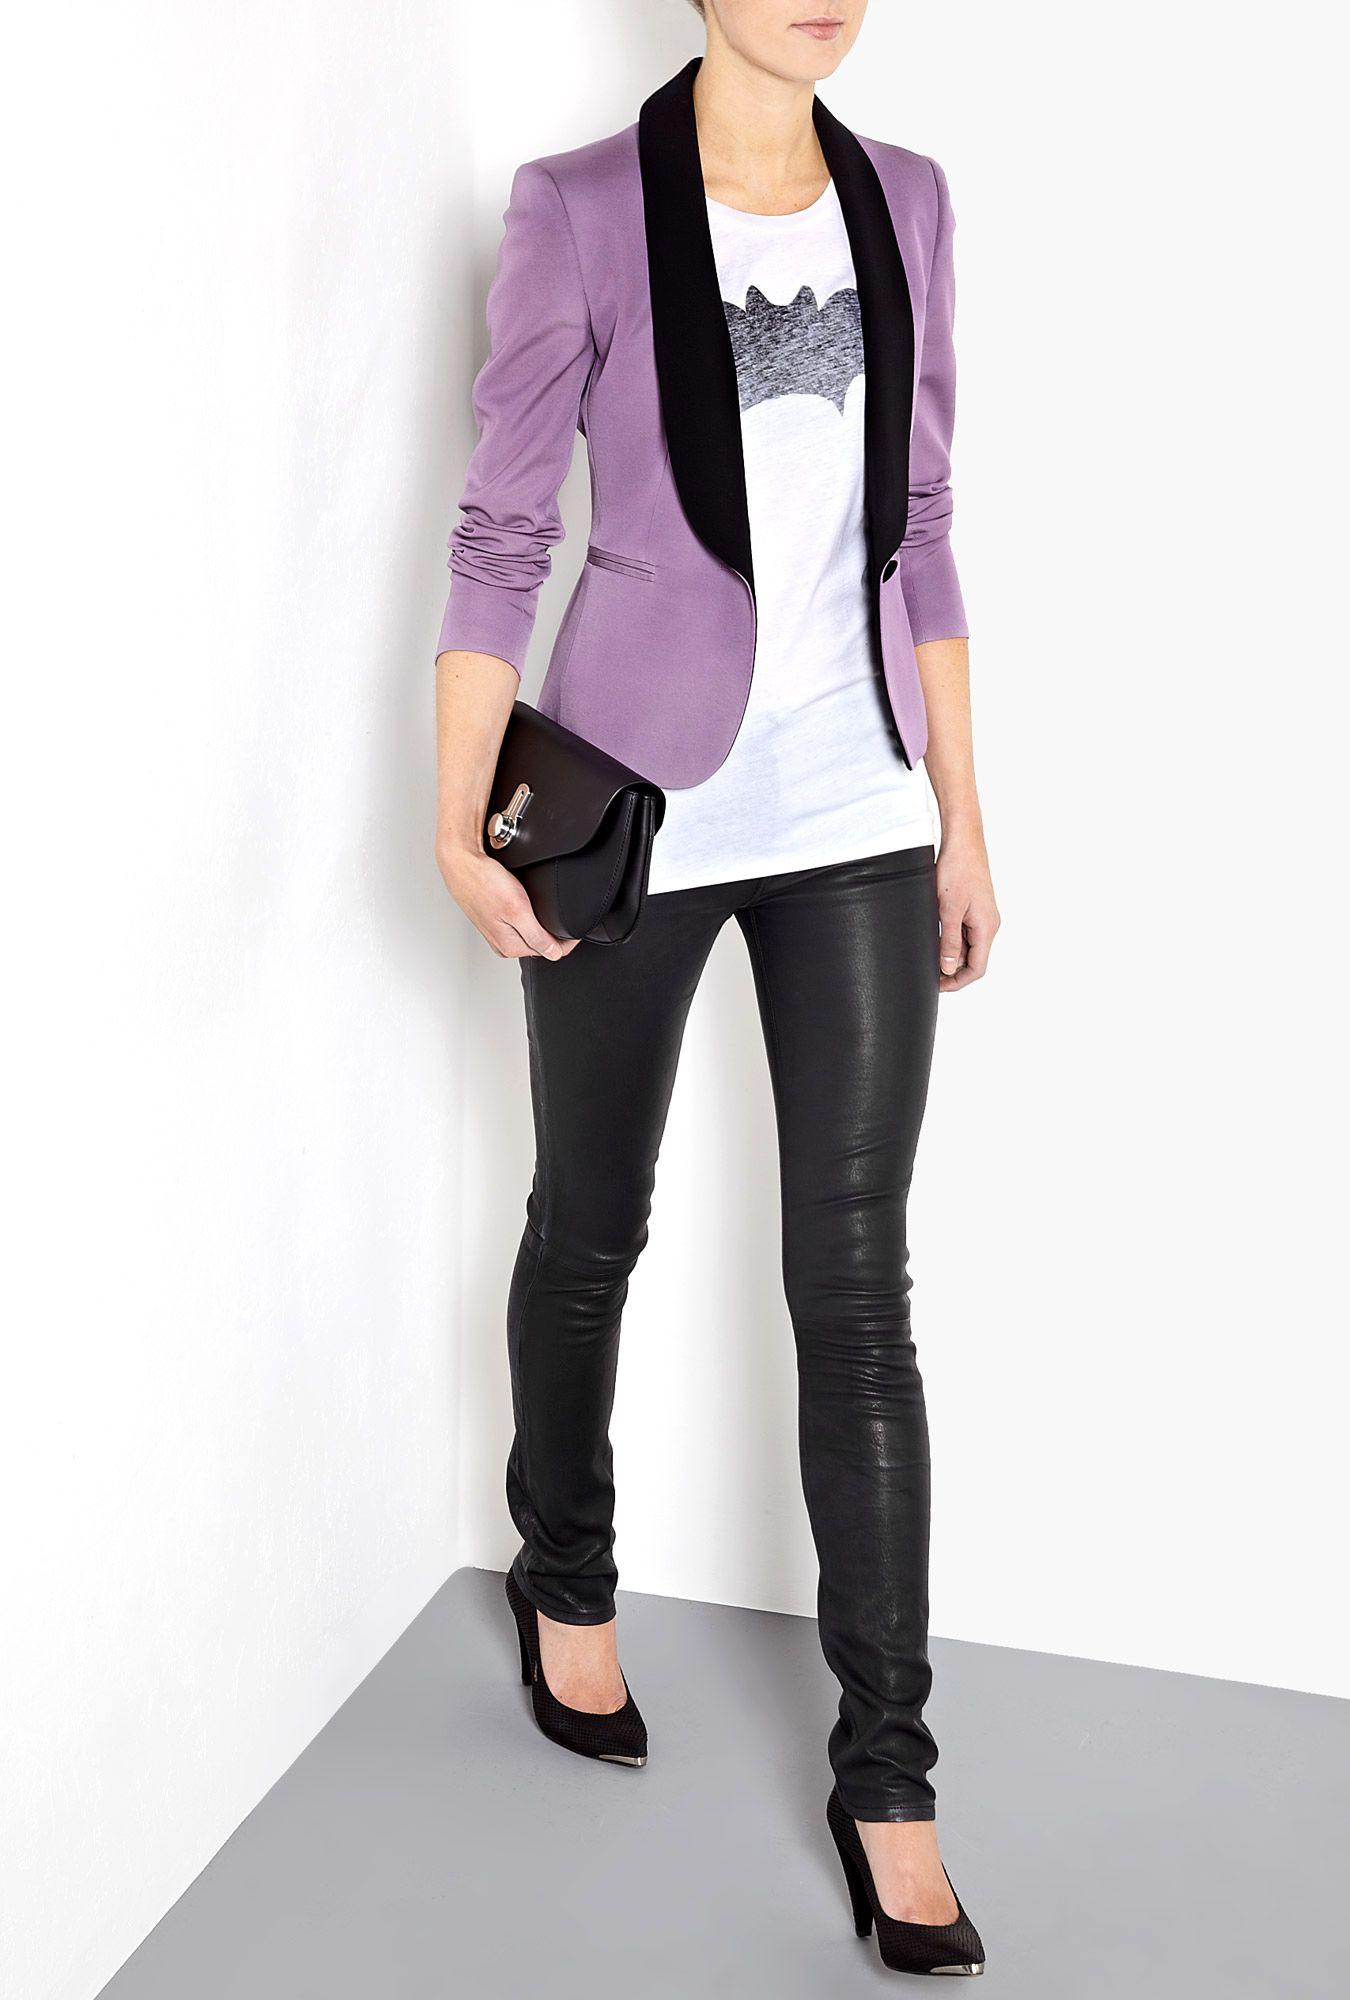 29c6c451 Black Iris Waxed Leather Tilda Straight Leg Jeans by Hudson ...